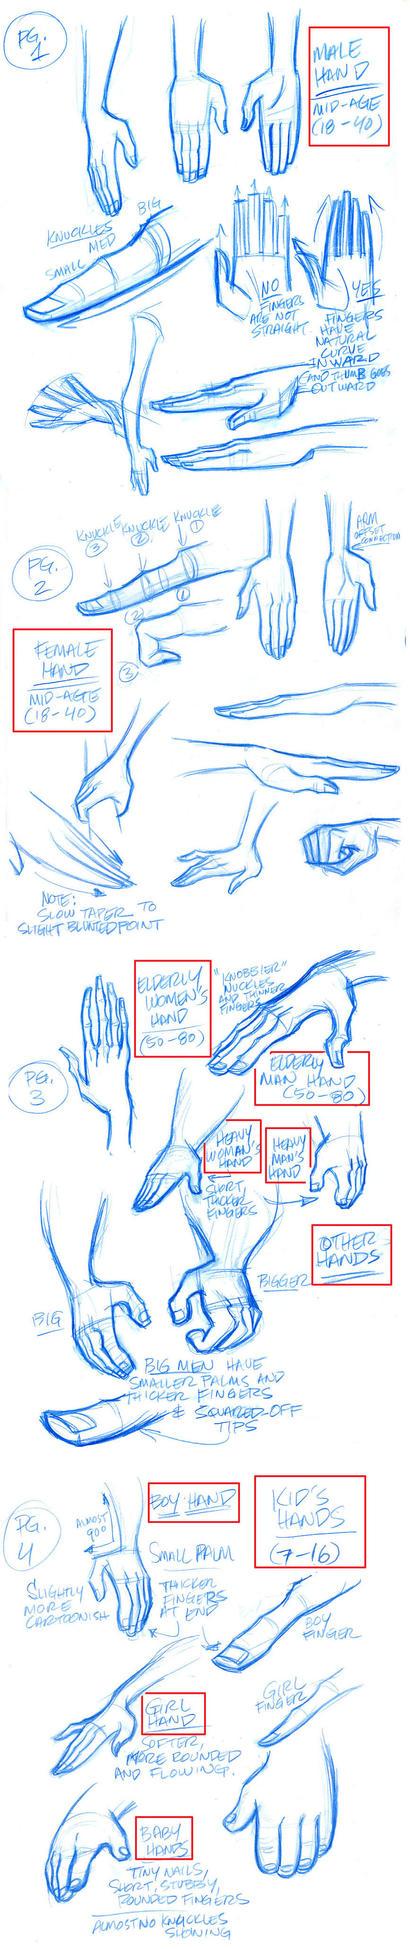 Stylized Hands model sheets by tombancroft